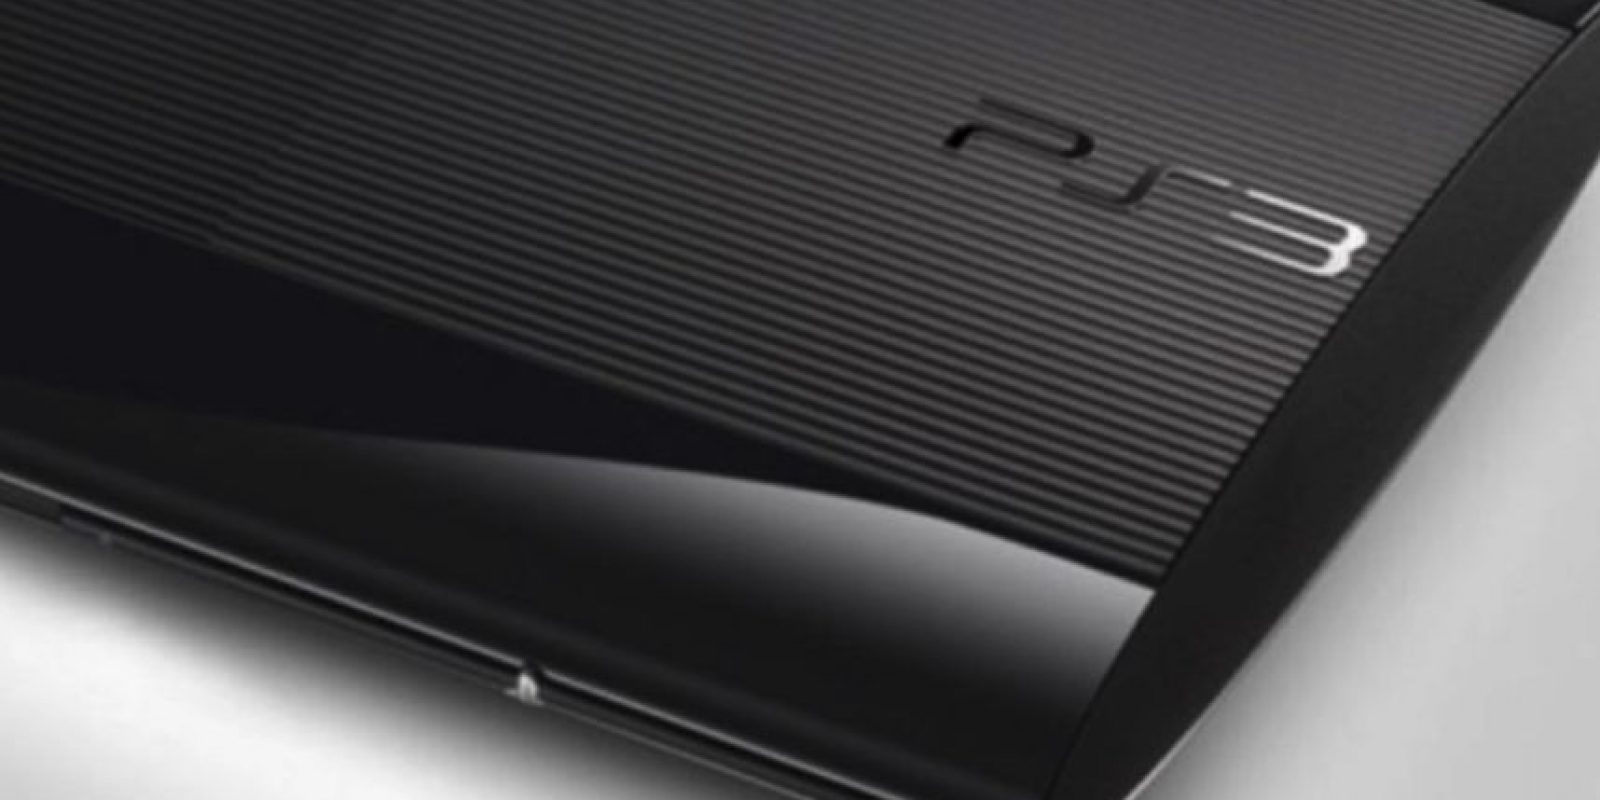 PlayStation Slim 3 Foto:Sony